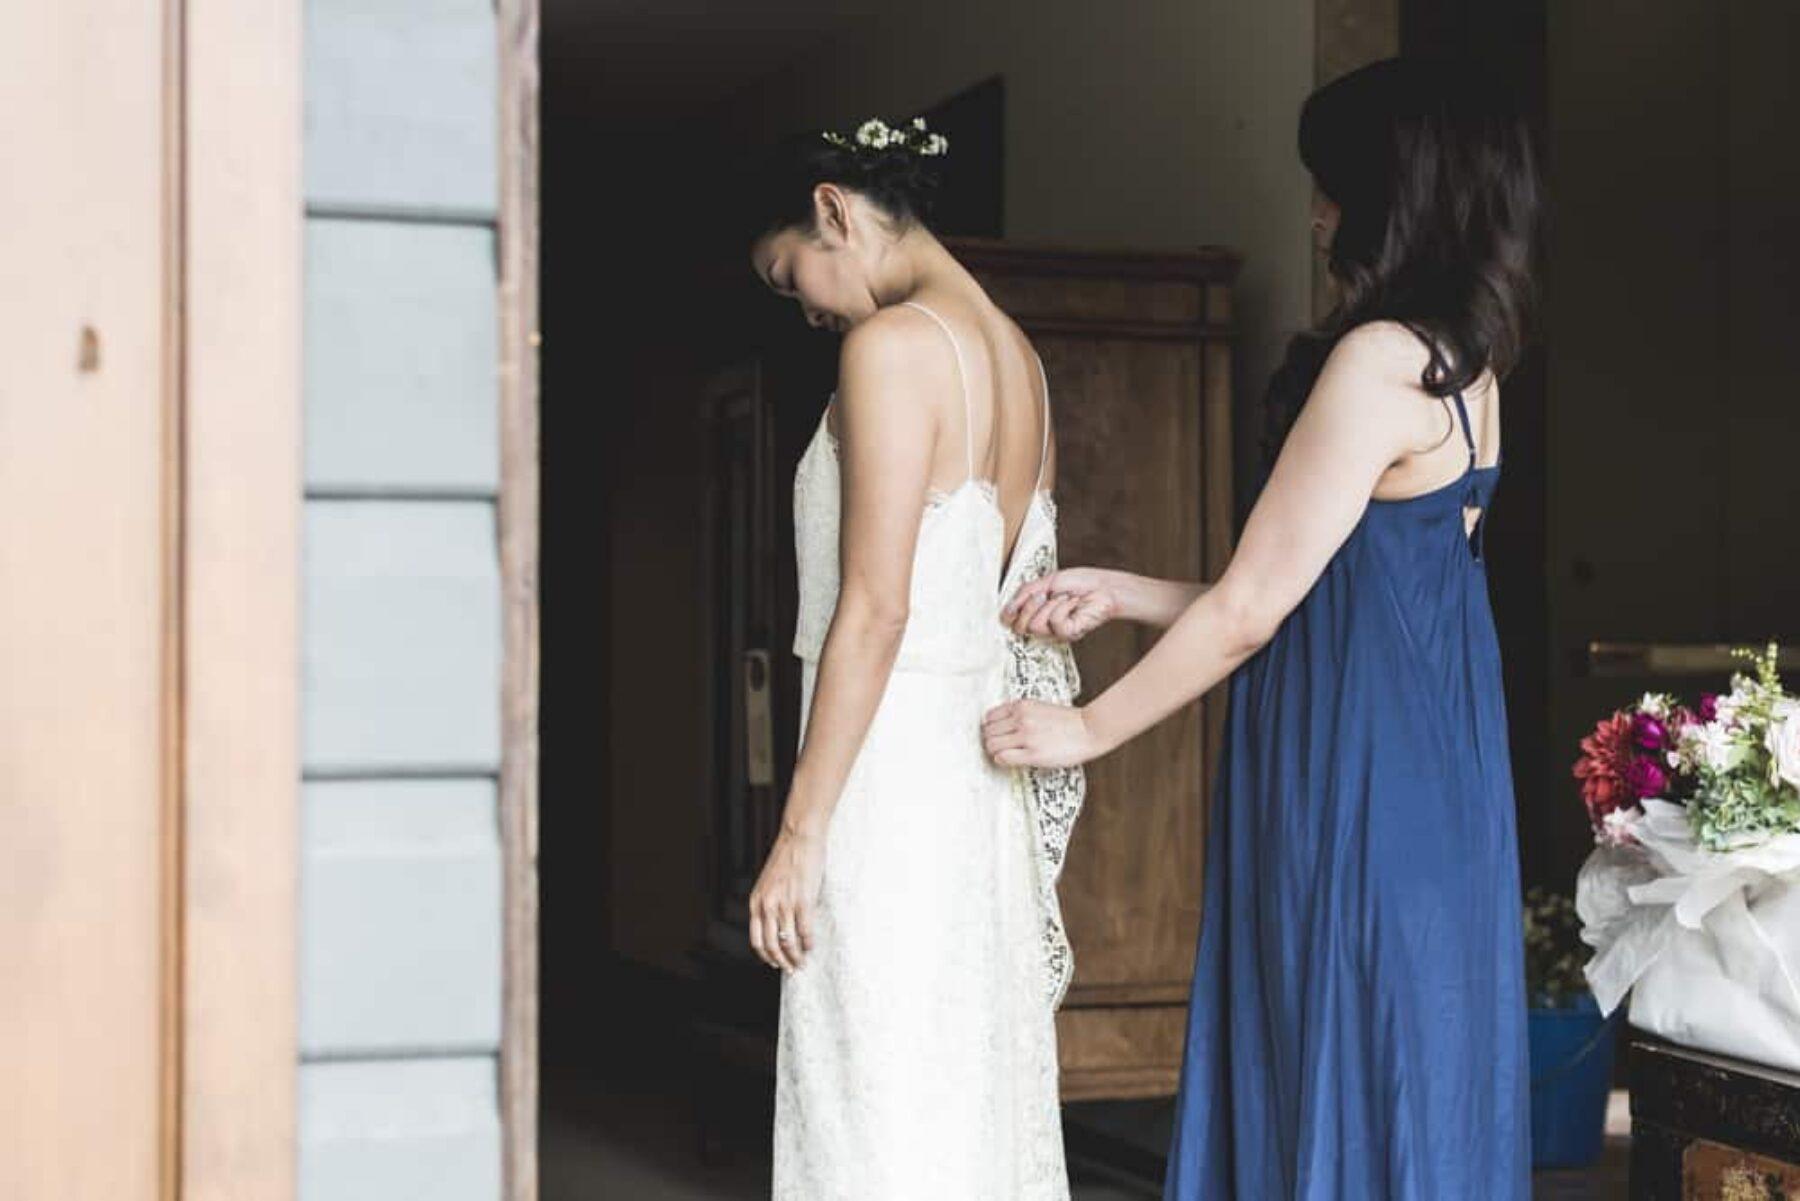 spaghetti strap wedding dress by Prea James Bridal